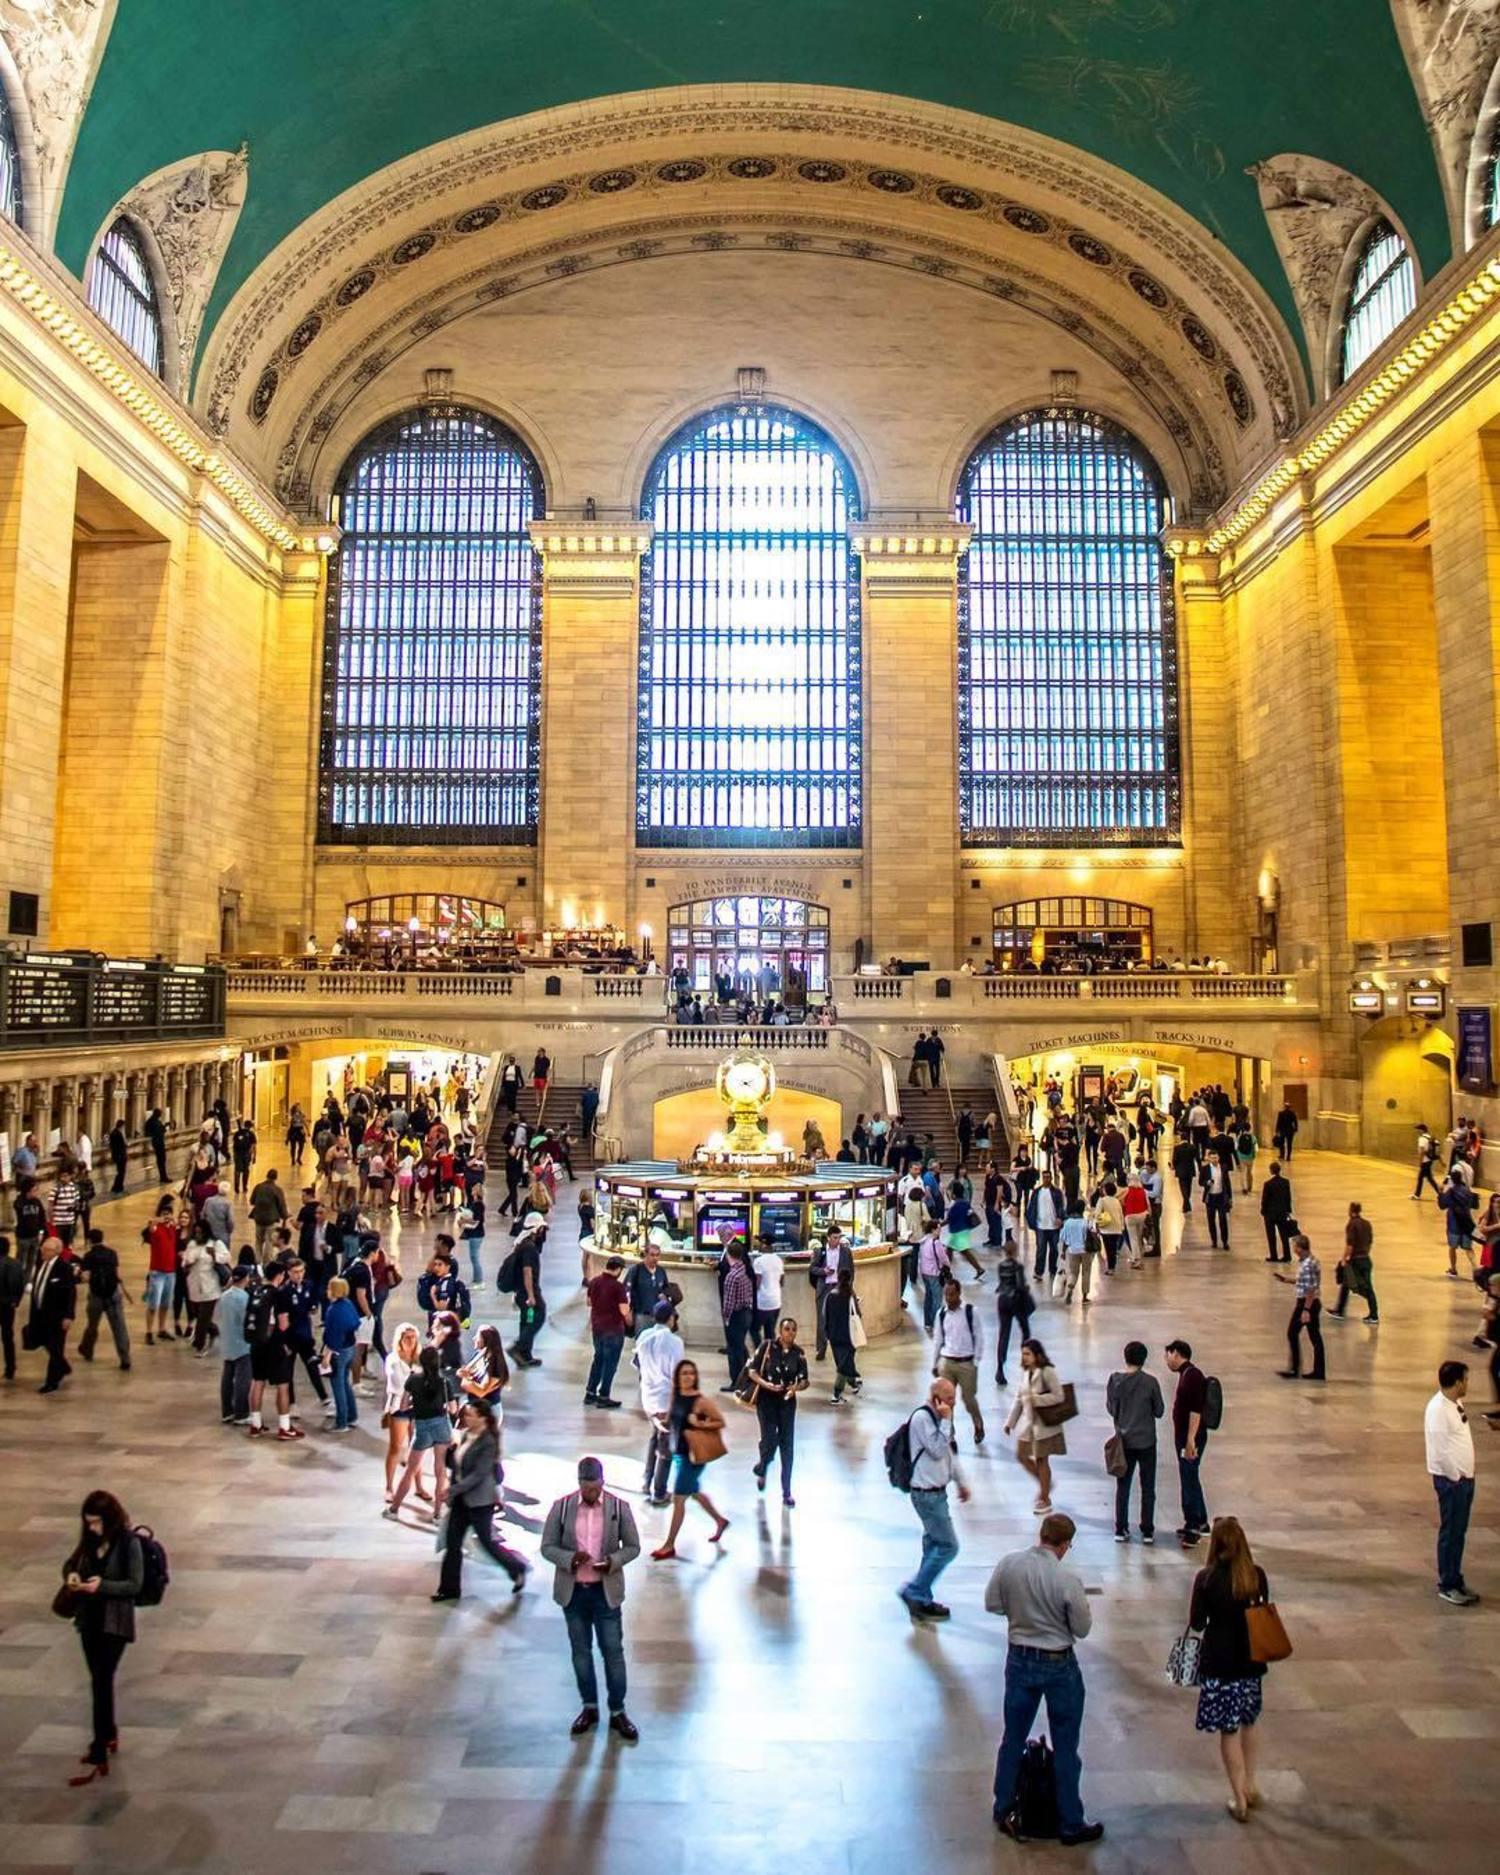 Grand Central Terminal, New York, New York